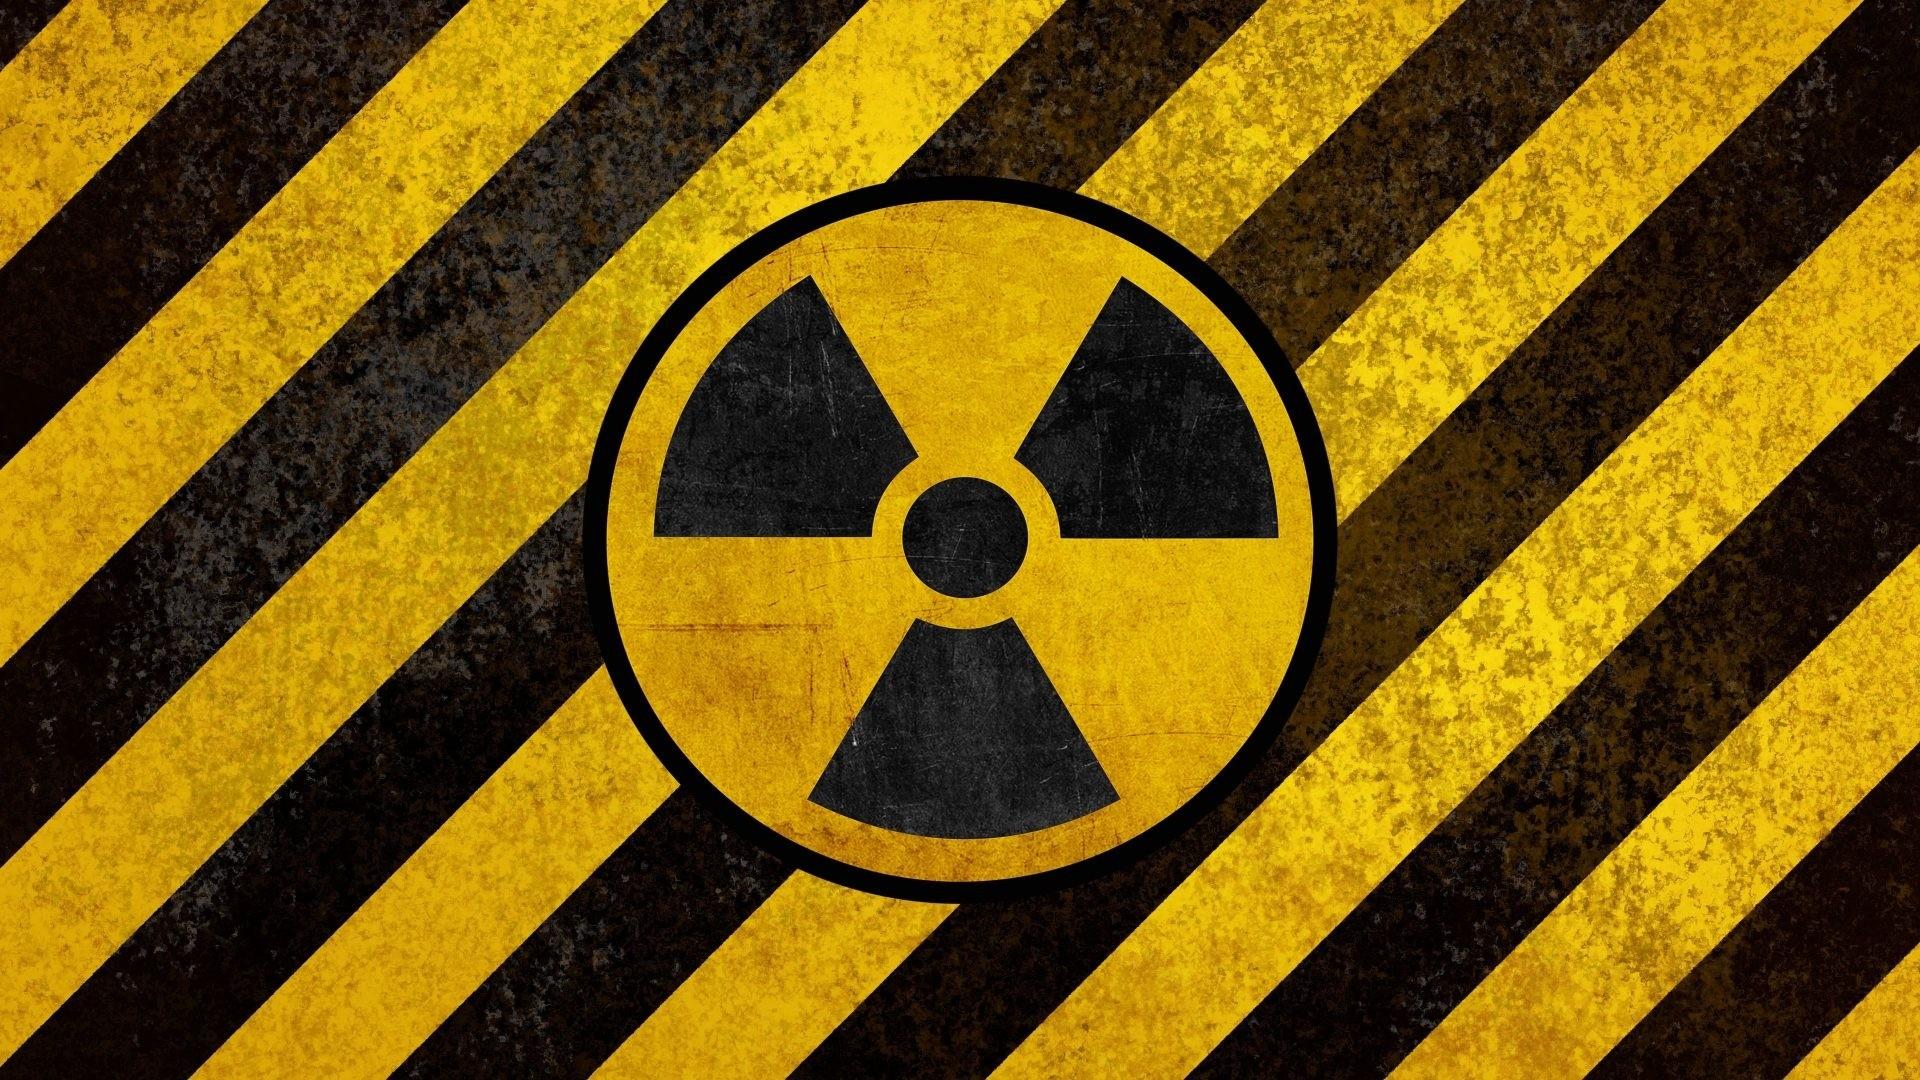 Danger HD Wallpaper Download